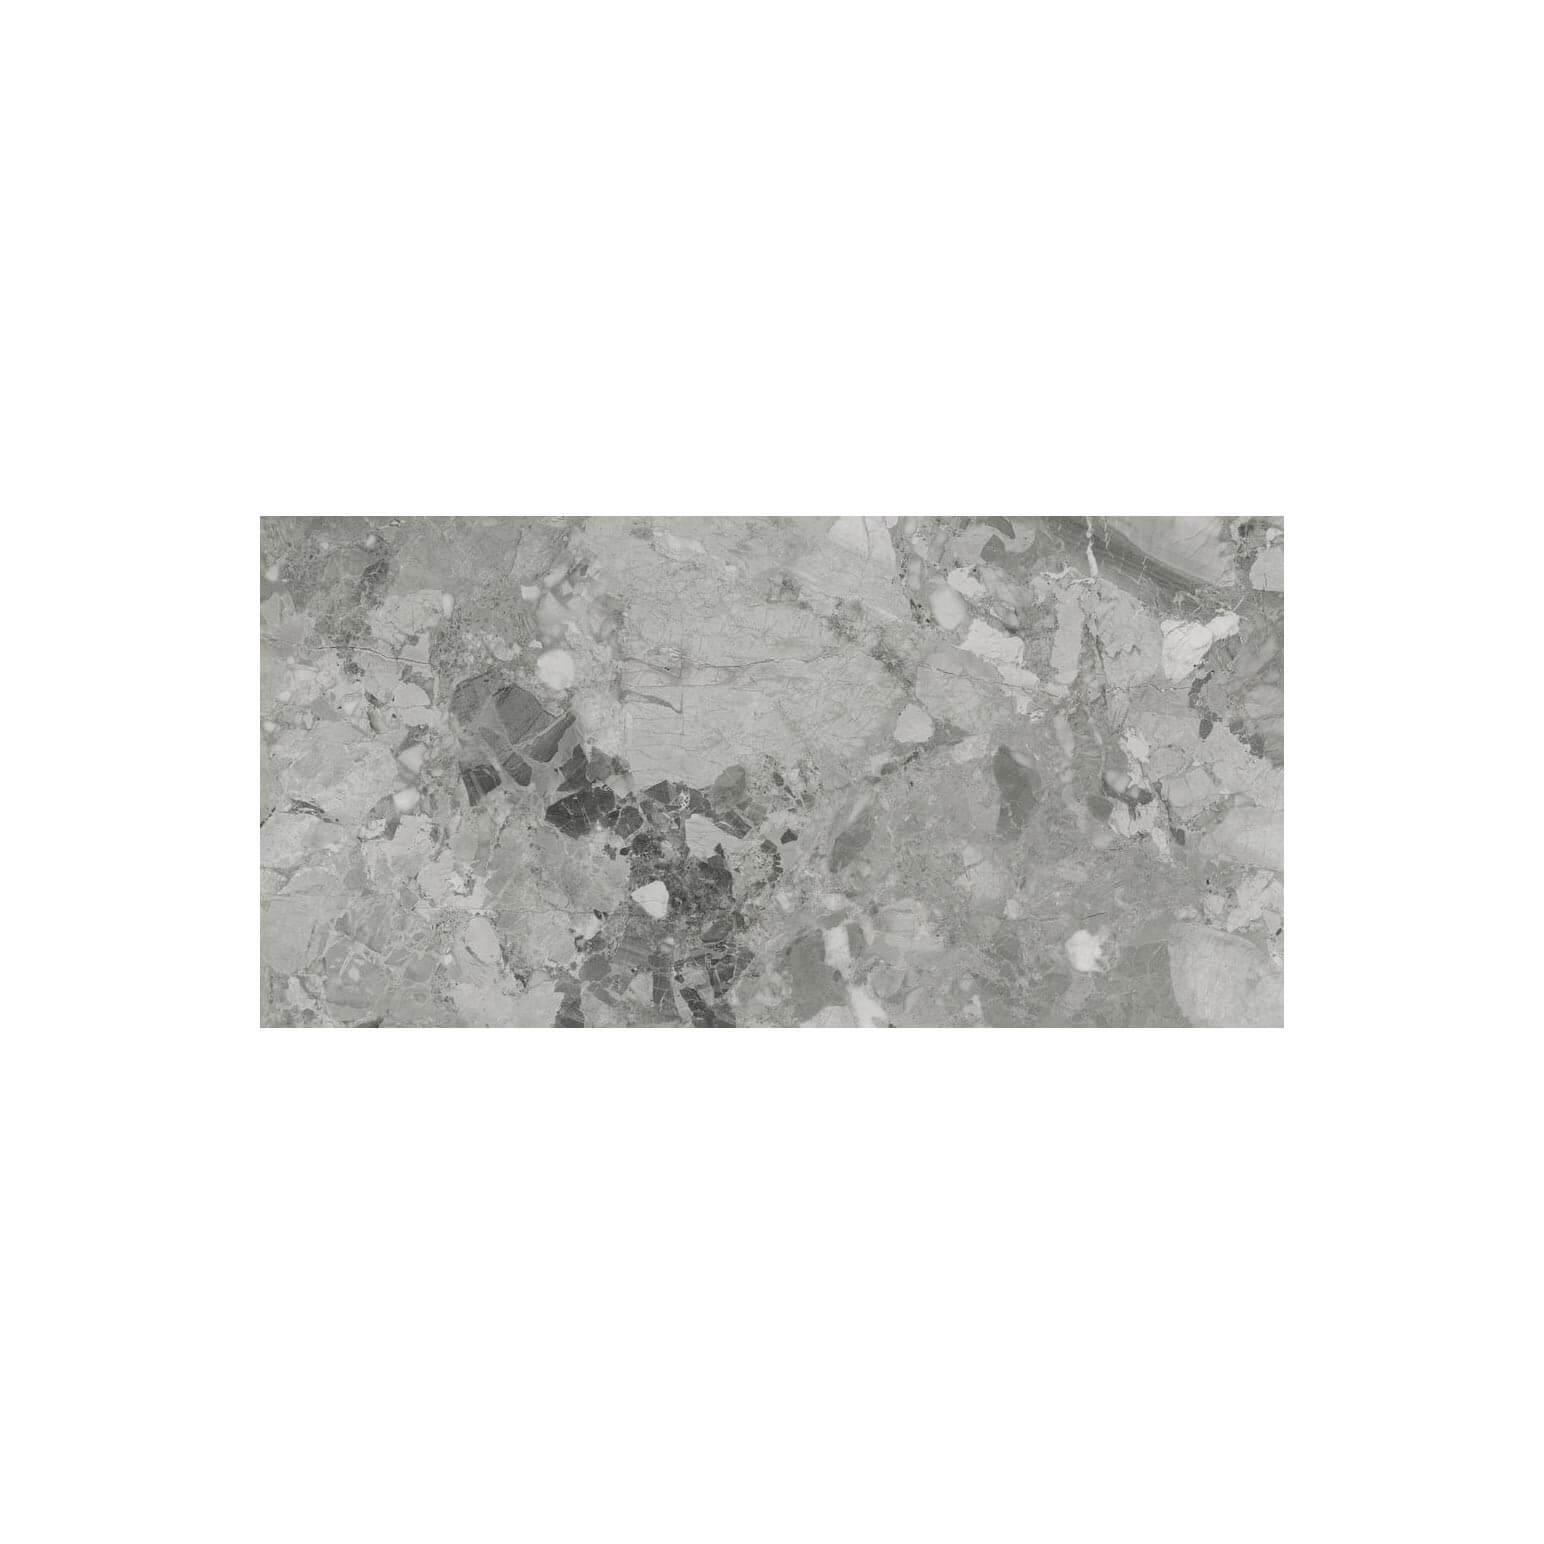 Carrelage sol et mur poli aspect marbre Realstone Grey 60x120 cm rectifié